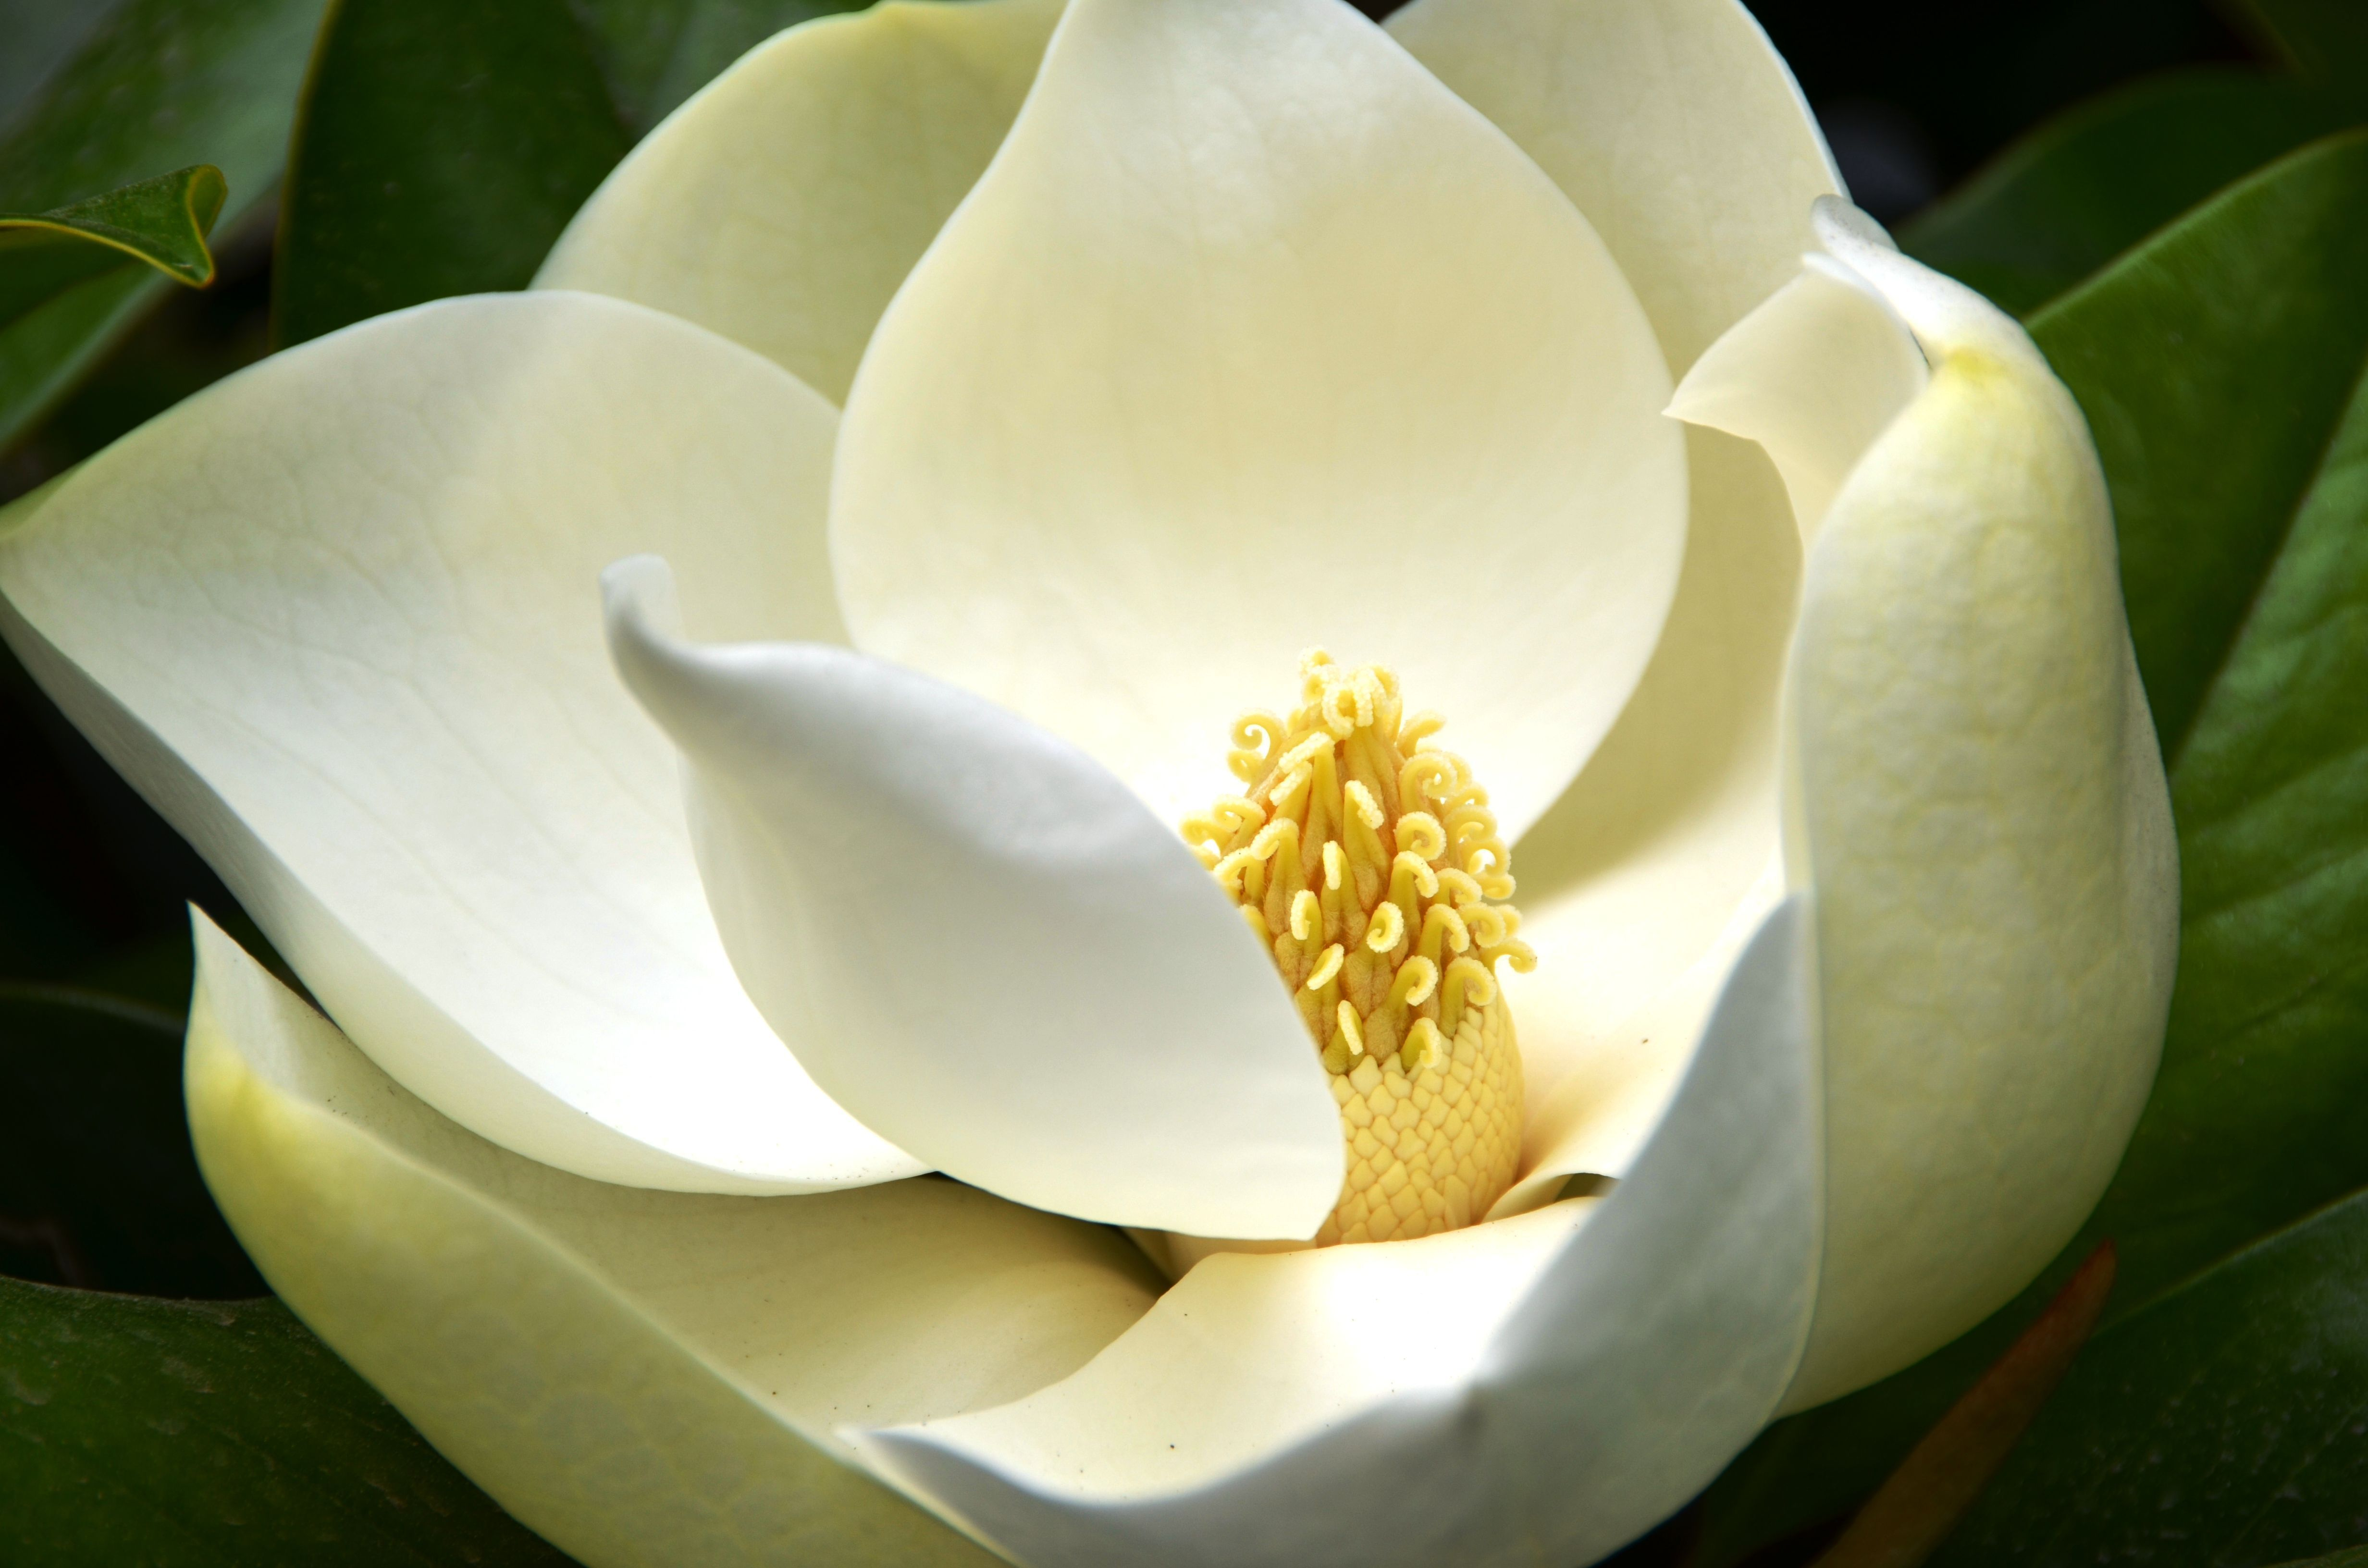 Magnolia Desktop Images